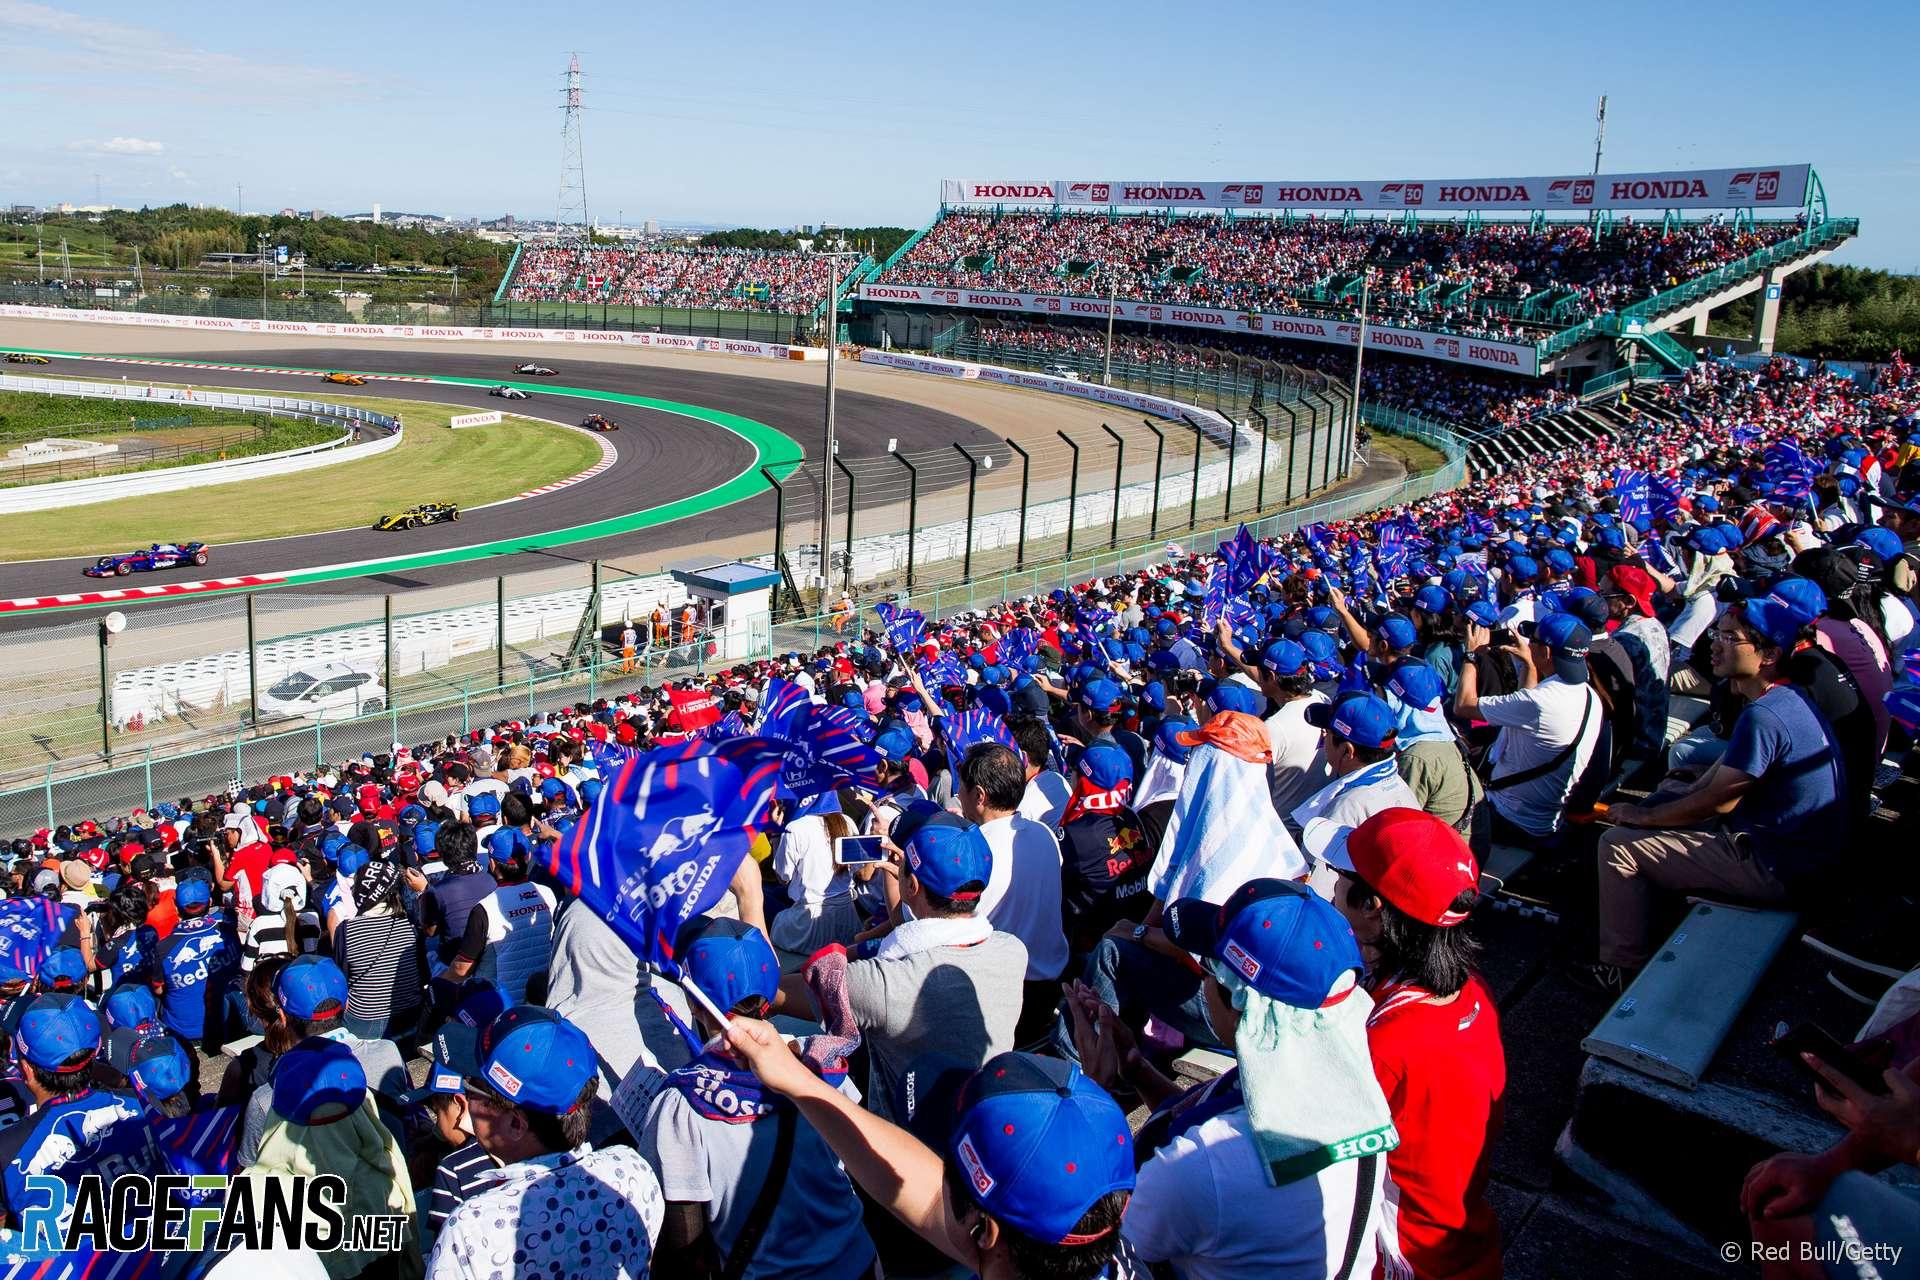 Brendon Hartley, Toro Rosso, Suzuka, 2018